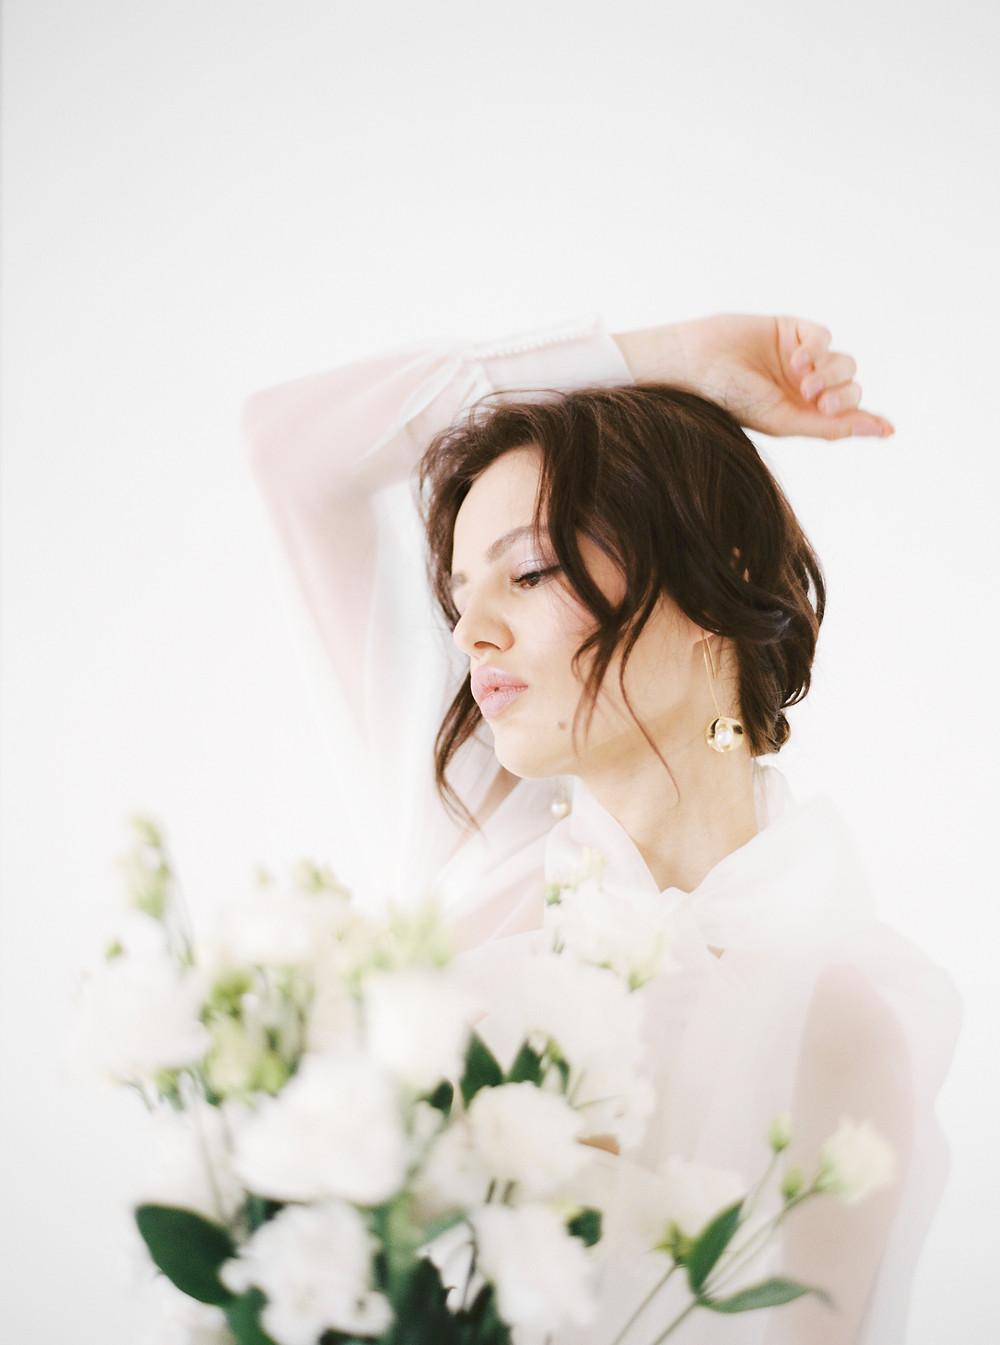 fine art wedding magazine, tale of tulle, luxury weddings, modern bridal inspo, modern bride, modern weddings, minimalist wedding, bride inspiration, wedding dress, wedding shoes